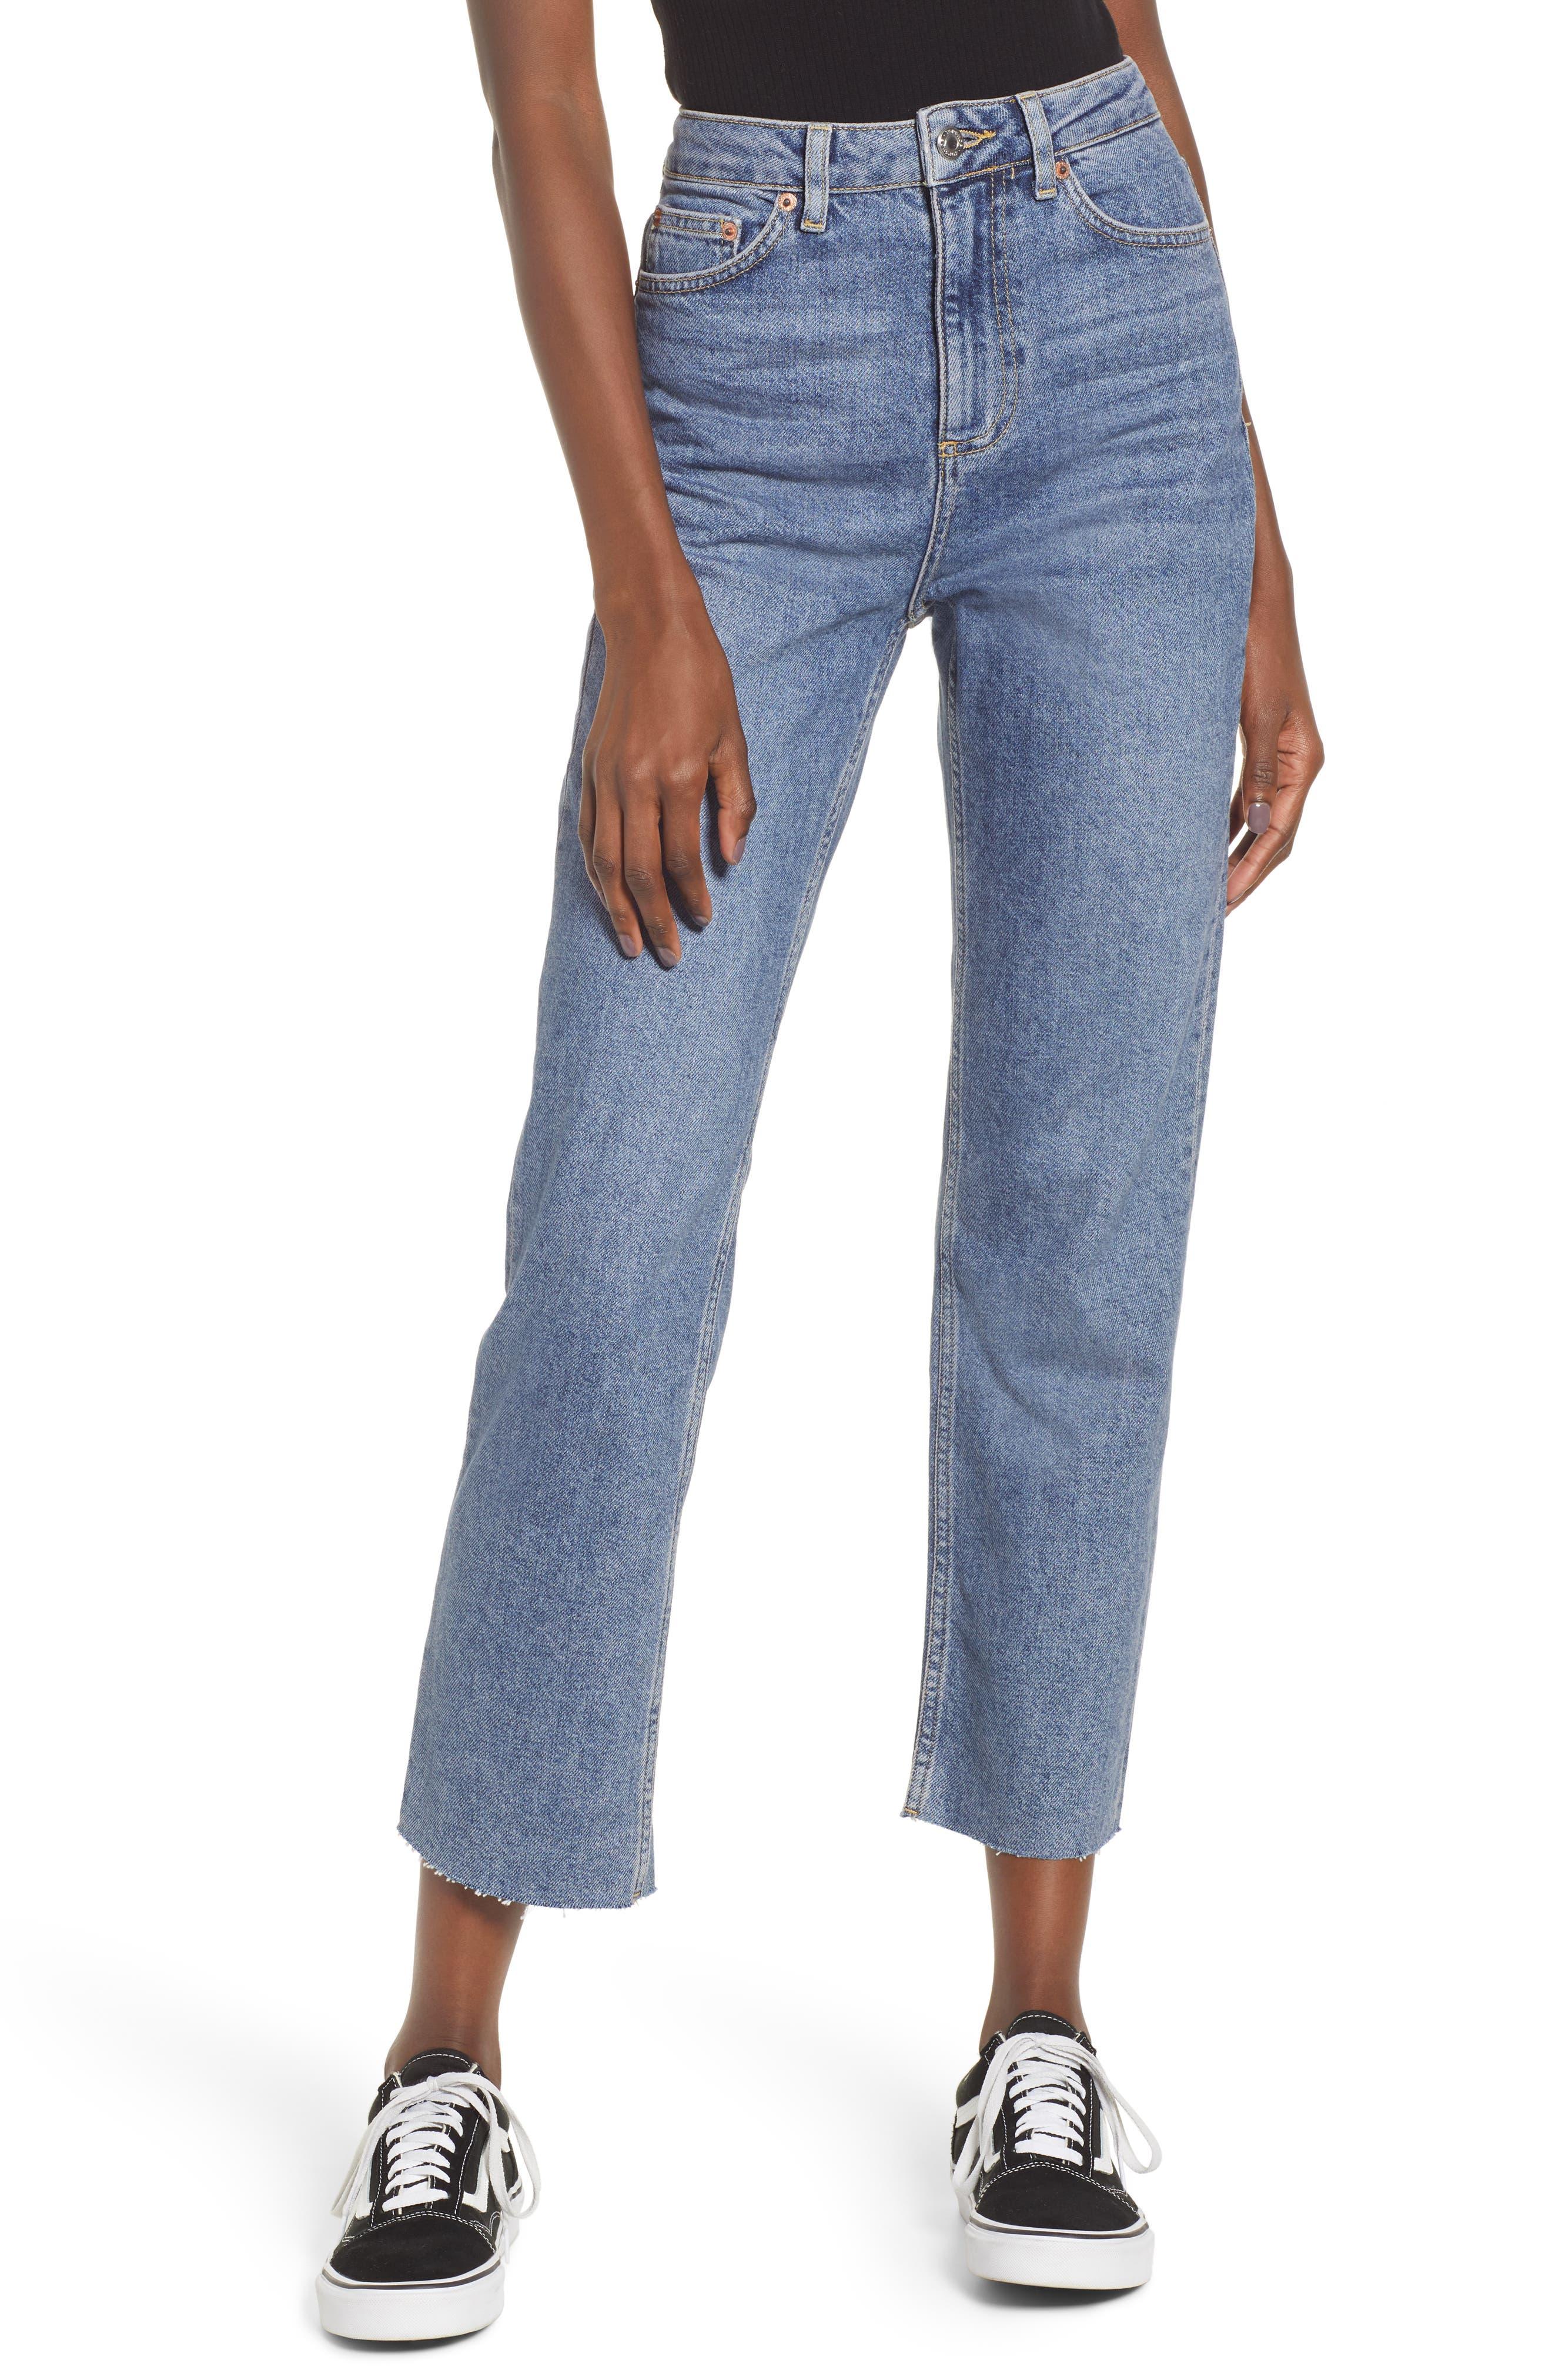 TOPSHOP, Raw Hem Straight Leg Jeans, Main thumbnail 1, color, MID BLUE